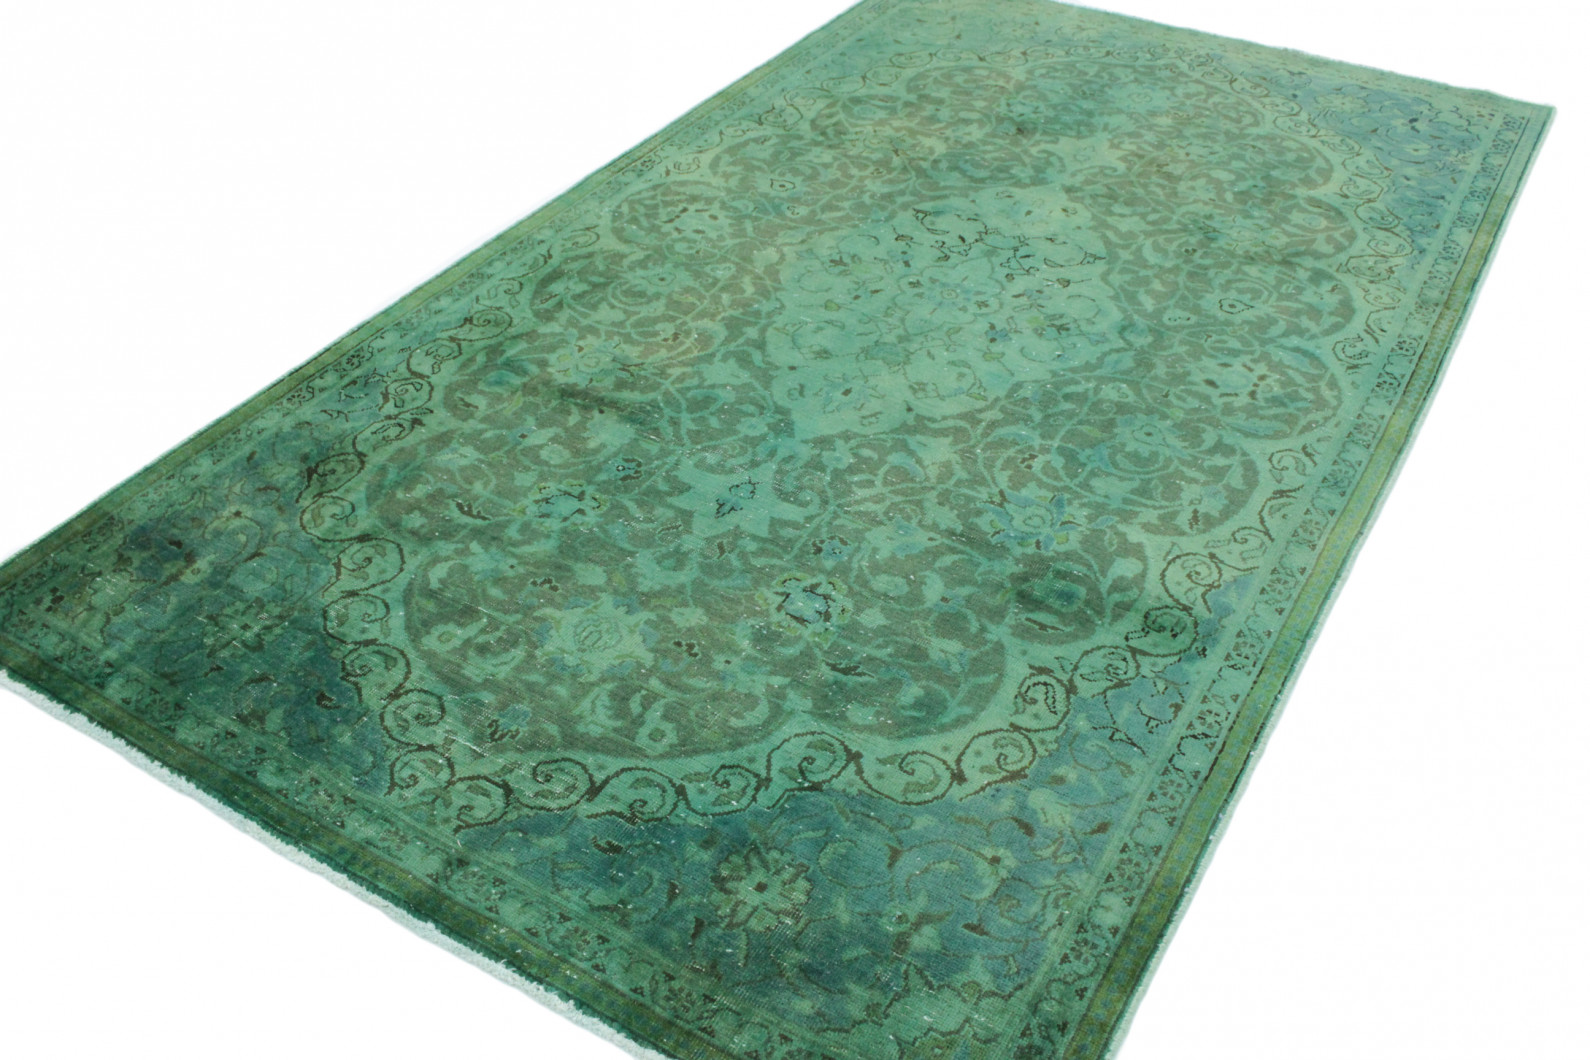 vintage teppich gr n in 280x150 1001 167029 bei kaufen. Black Bedroom Furniture Sets. Home Design Ideas